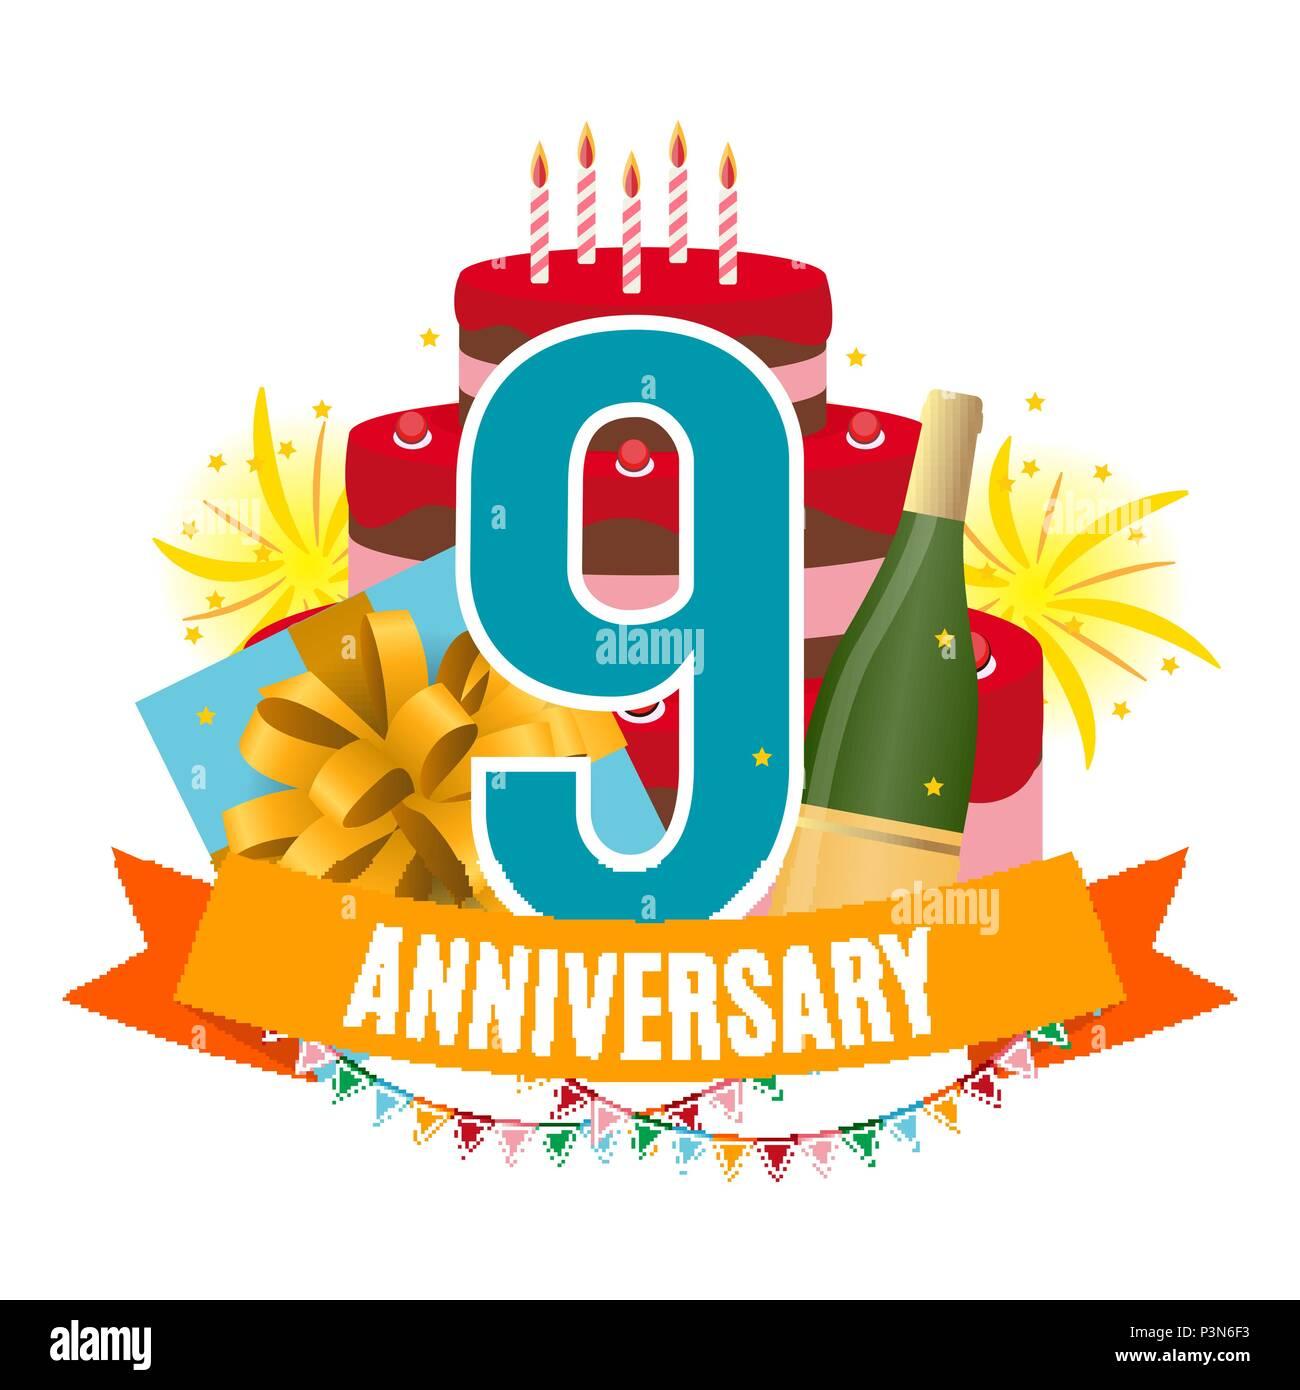 Anniversario Matrimonio 9 Anni.Template 9 Years Anniversary Congratulations Greeting Card With